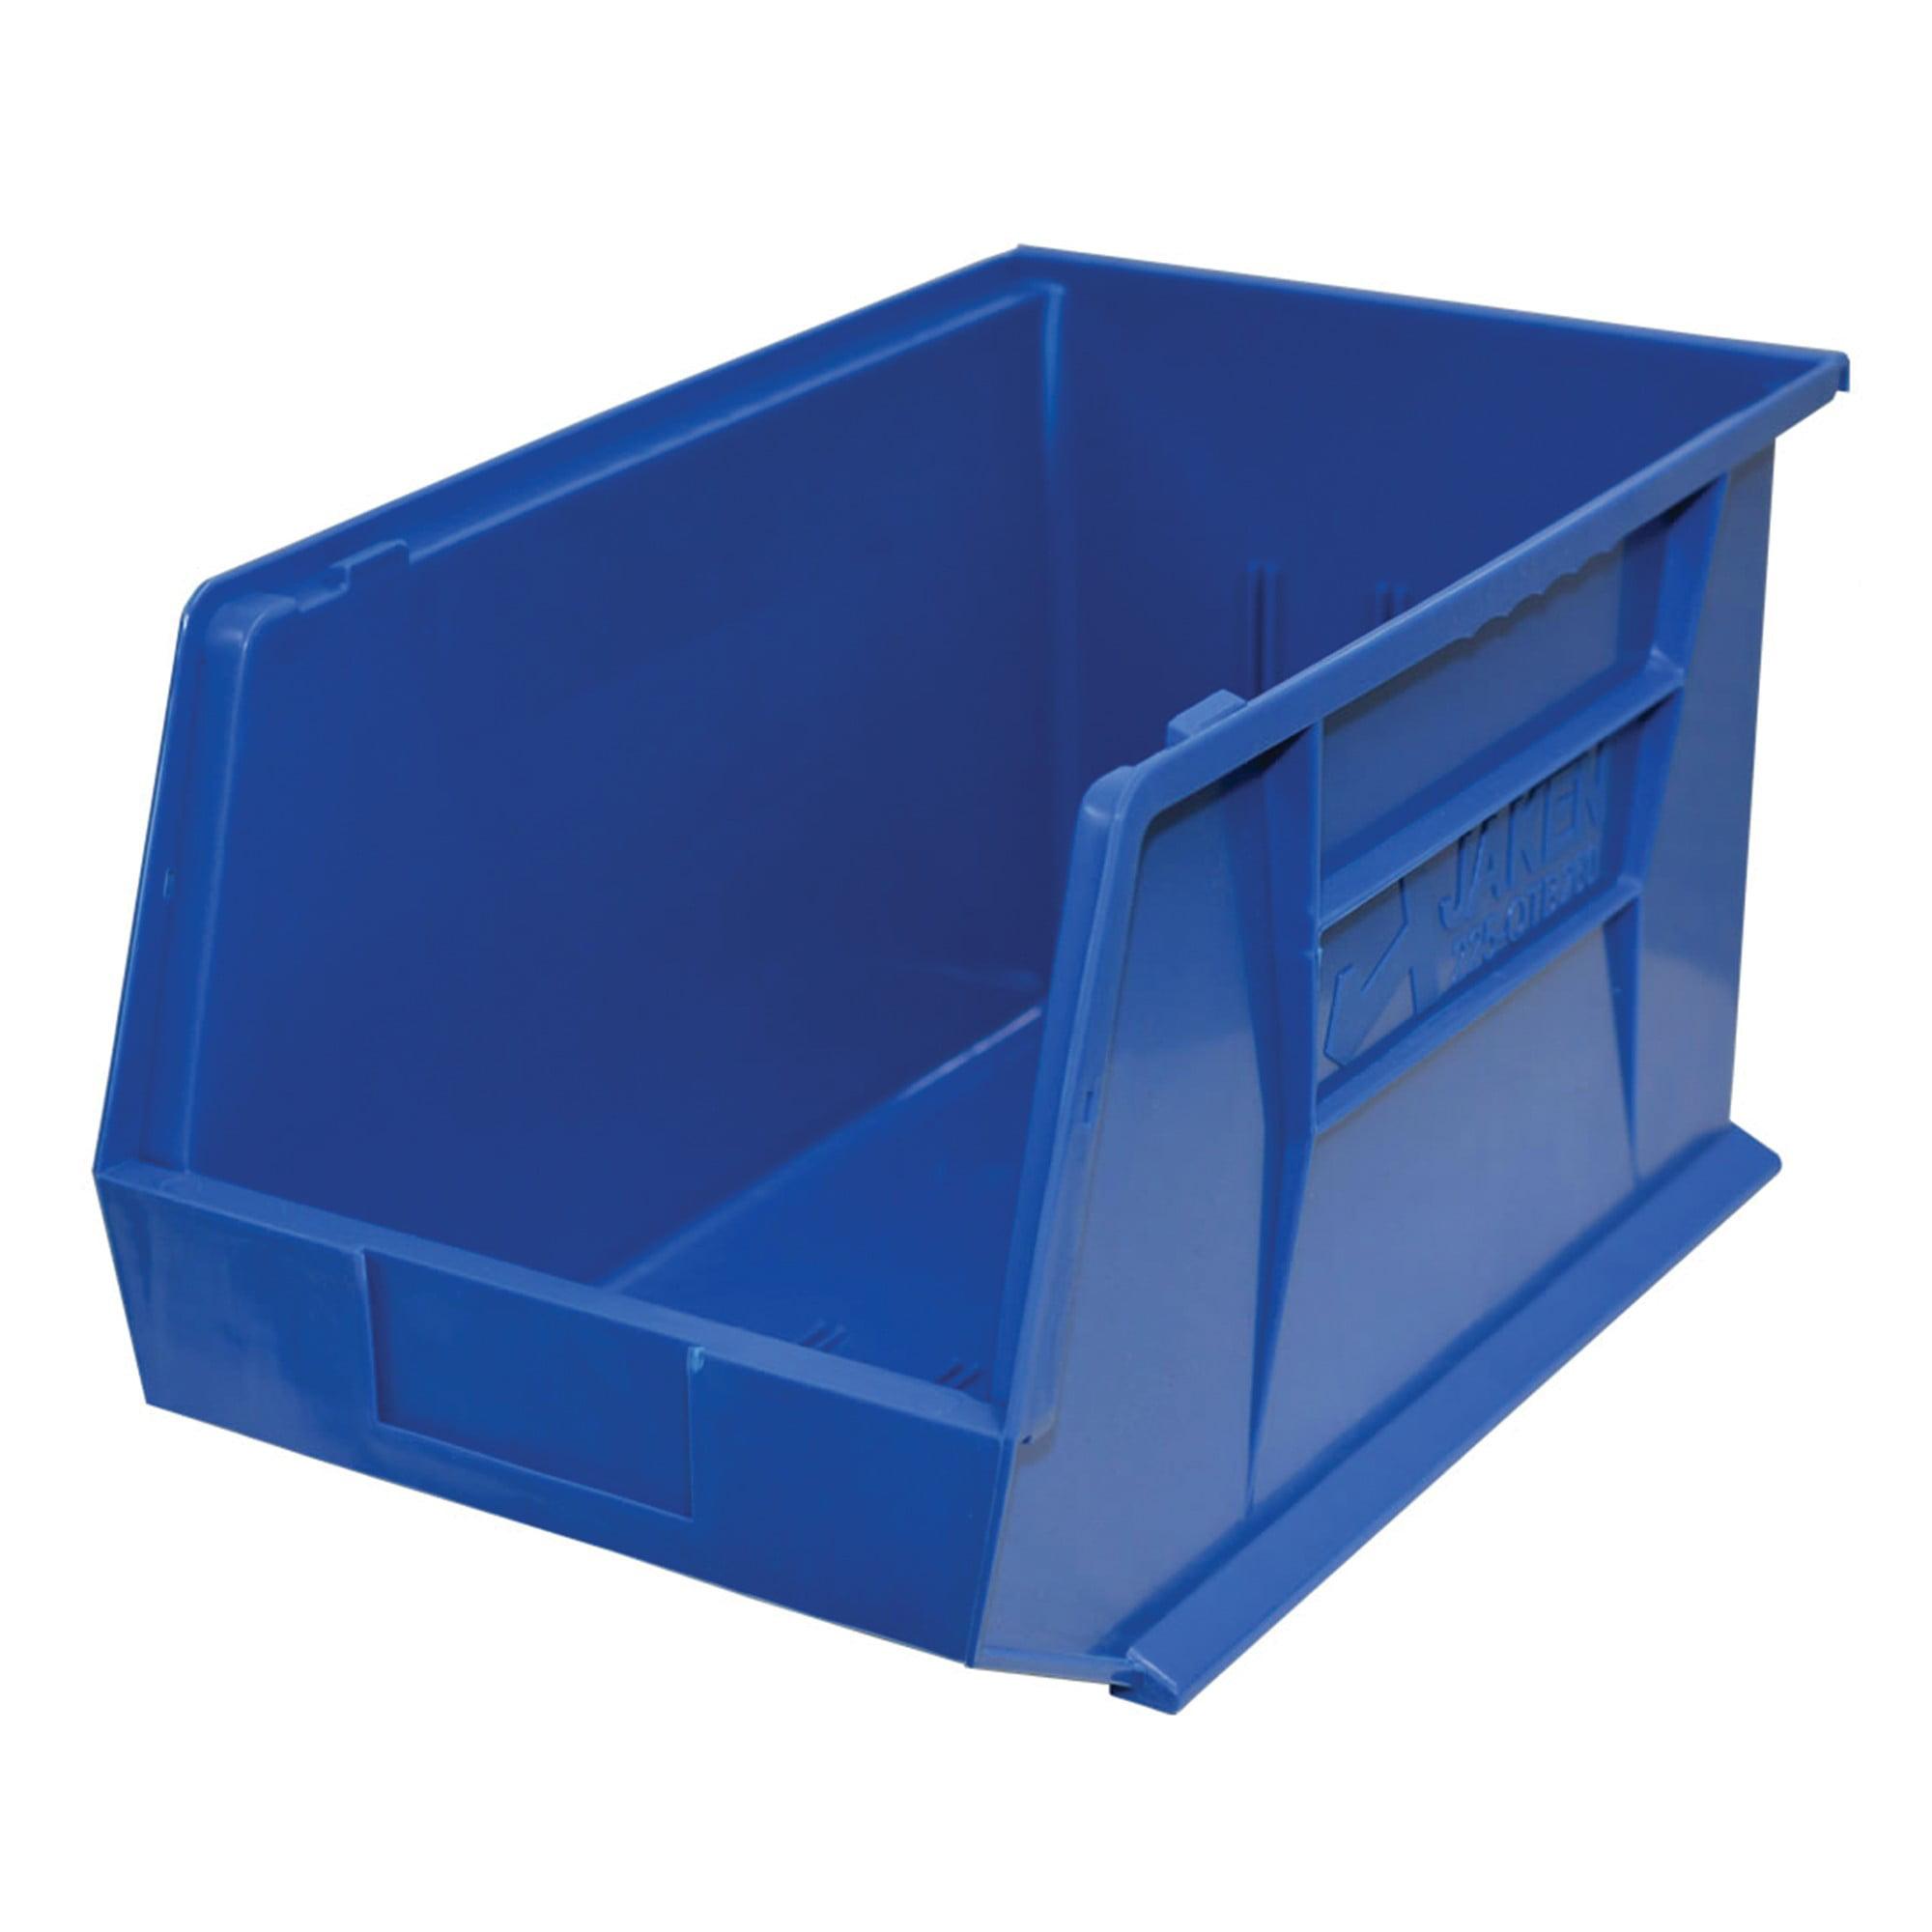 "Storage Max Case of Stackable Blue Bins, 18"" x 11"" x 10"" (4 bins)"